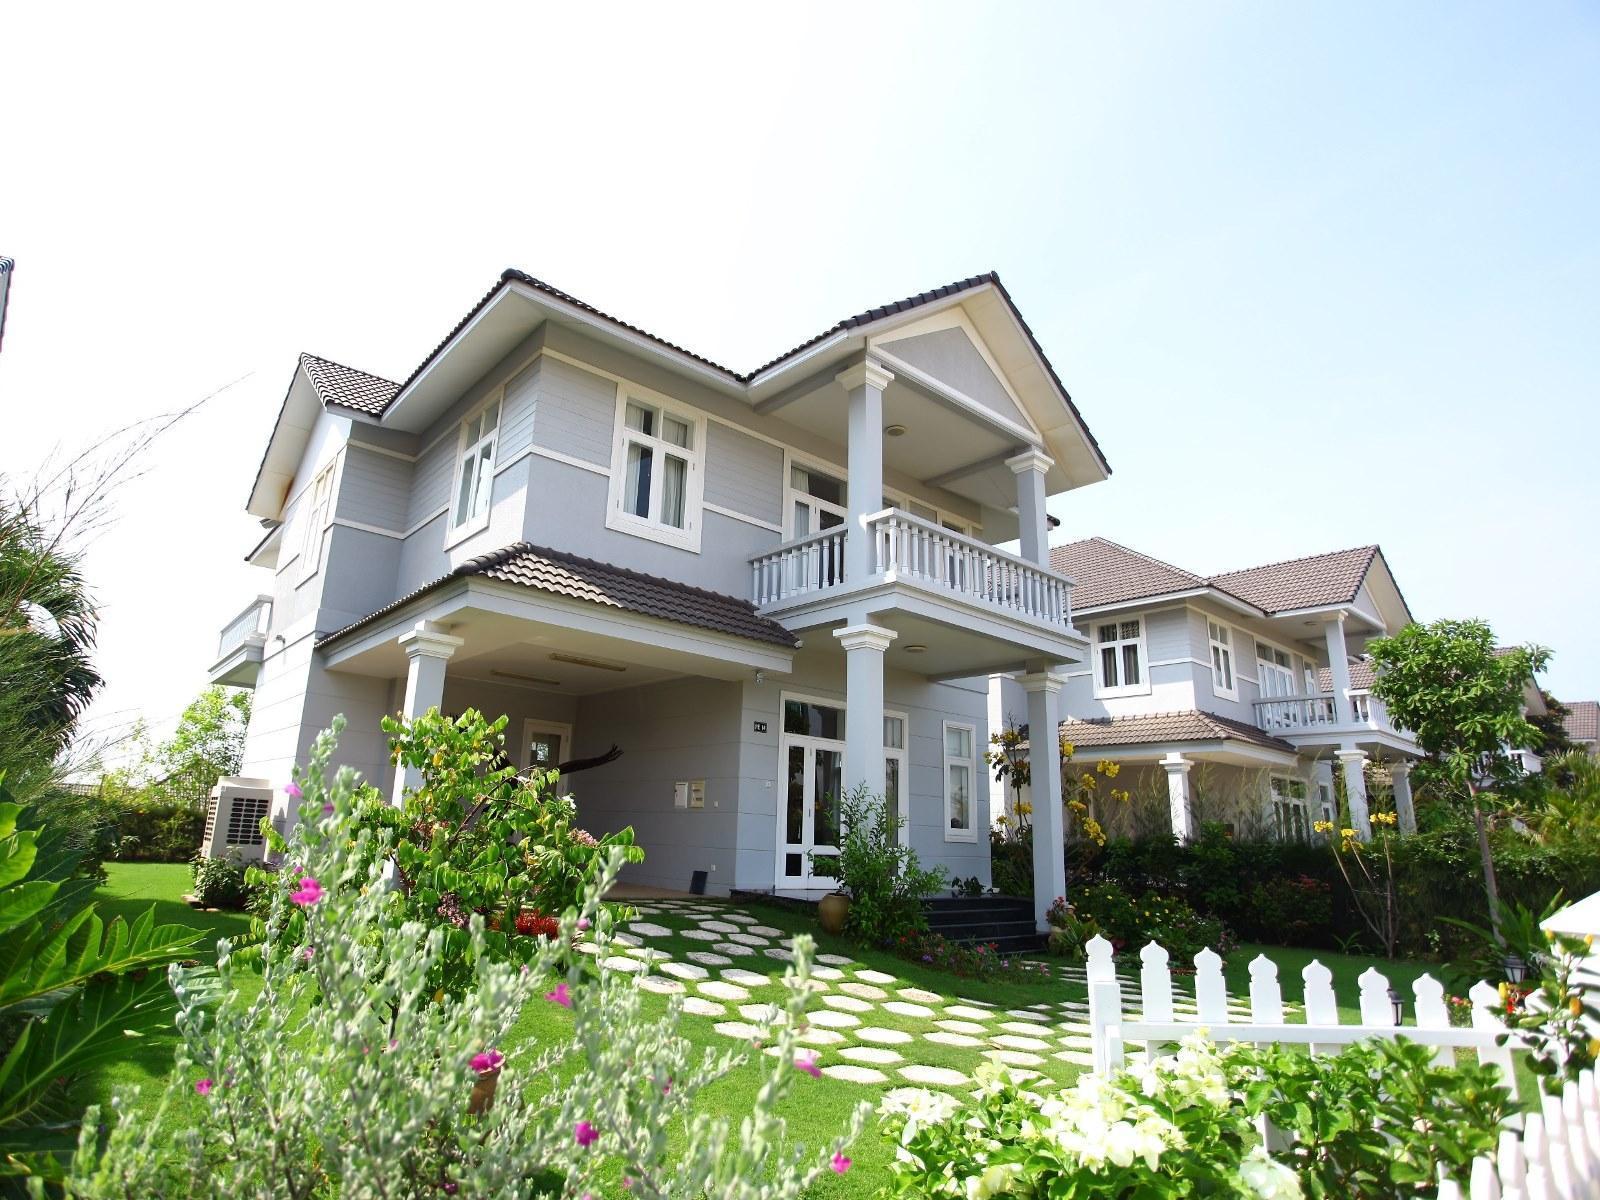 Nathalie's Villa